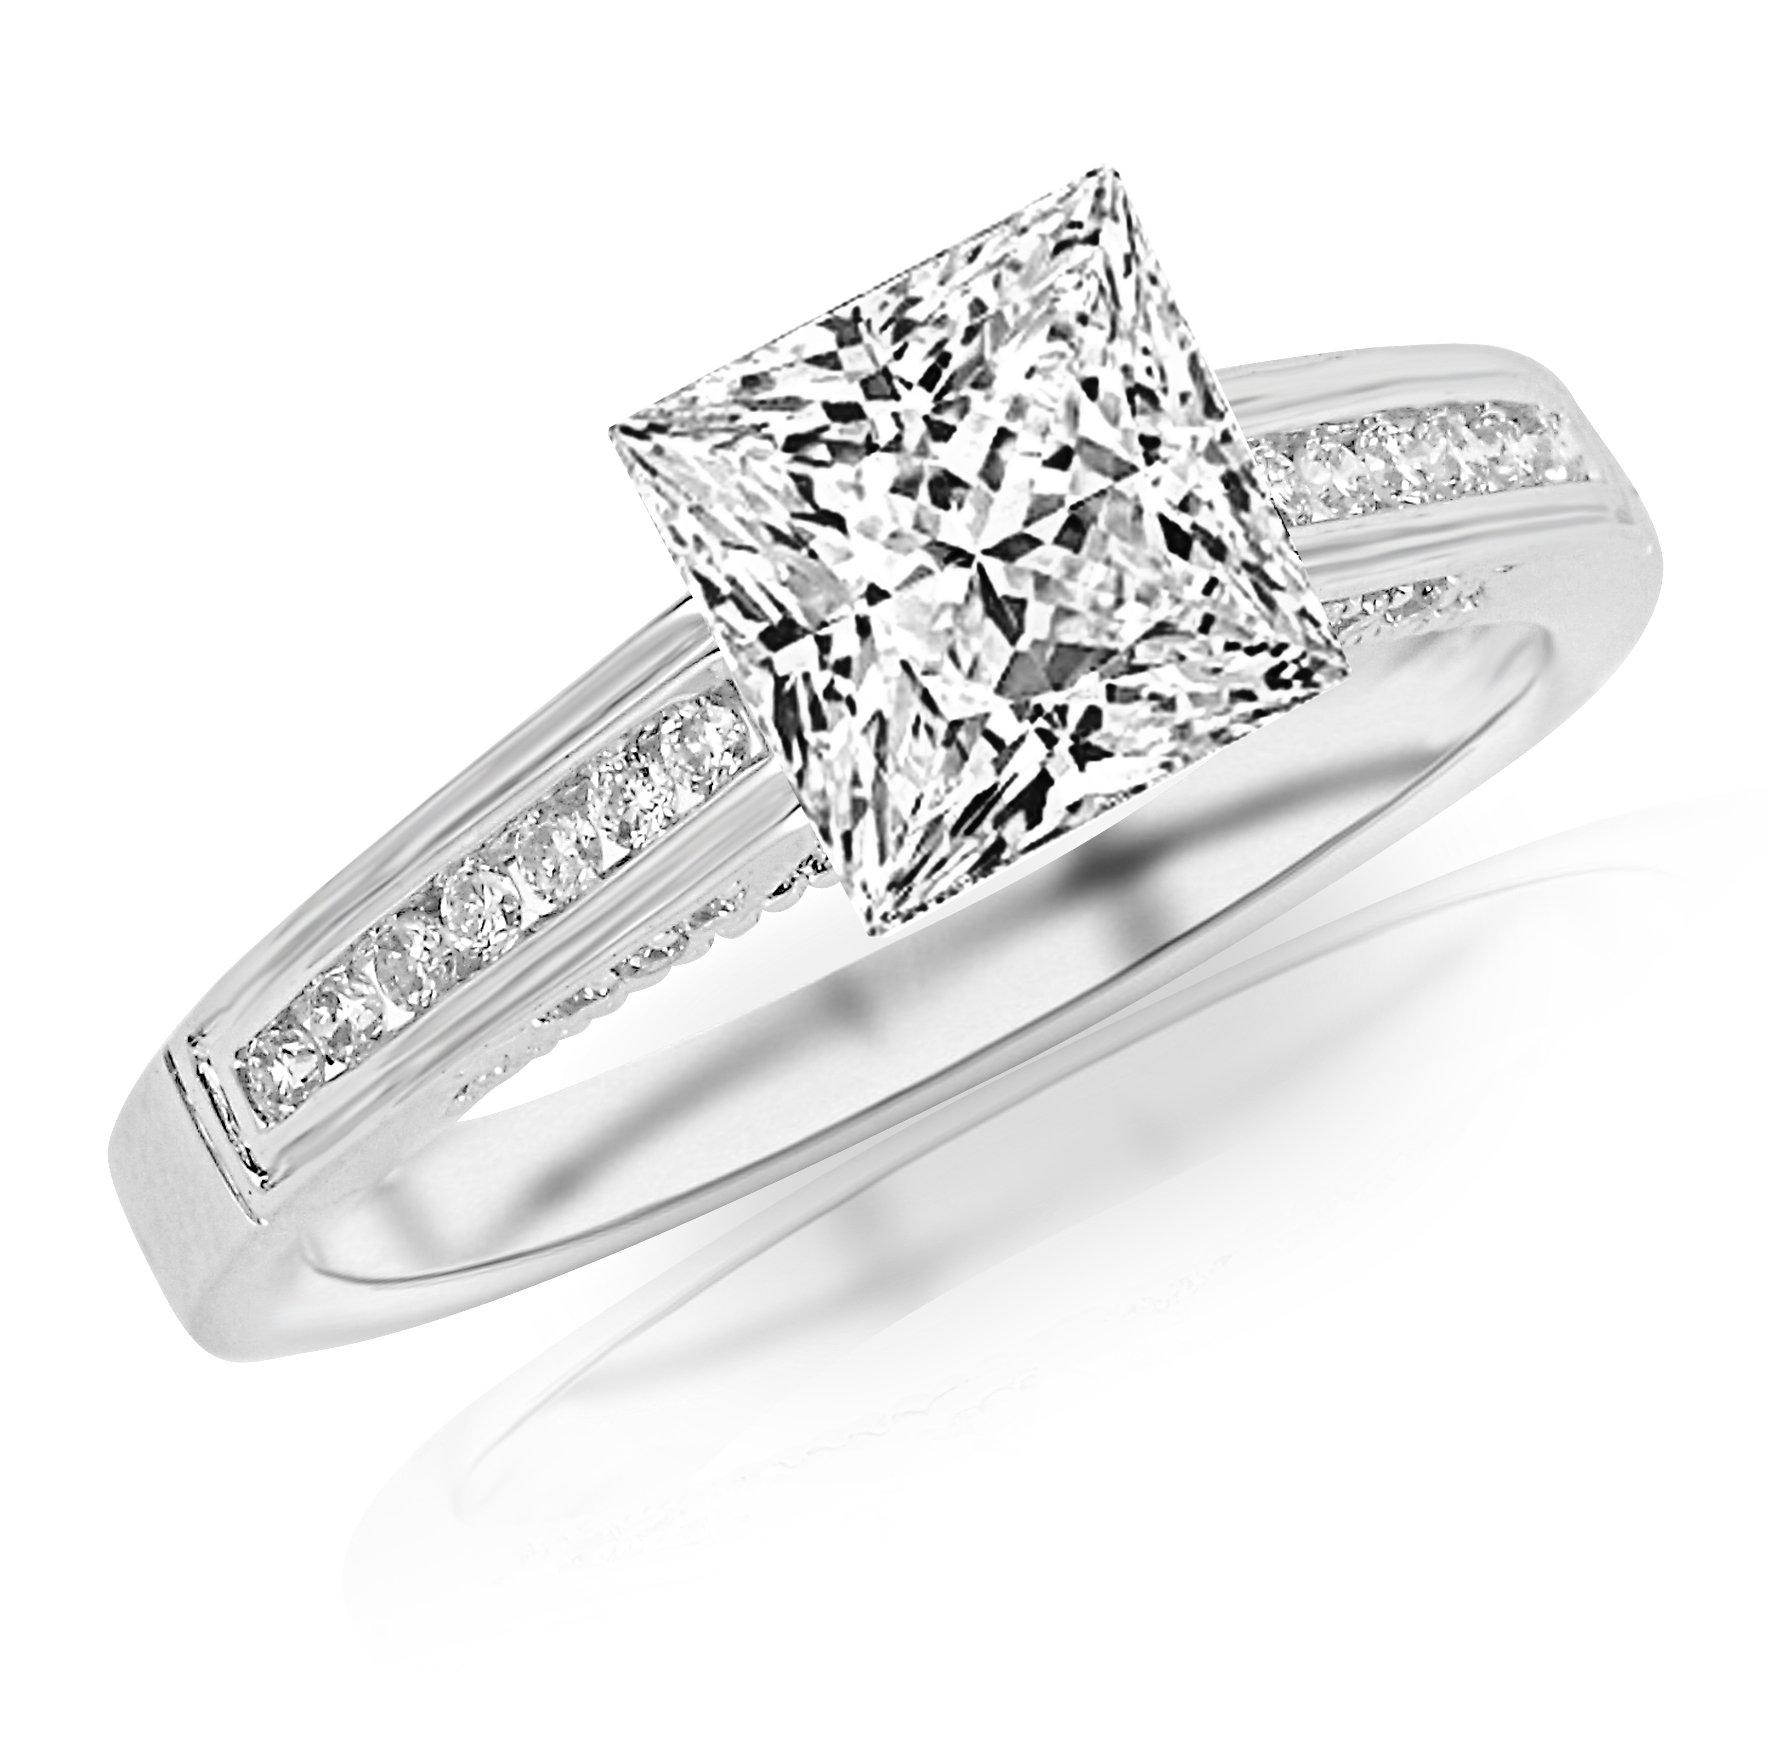 0.53 Carat Princess Cut Classic Channel Set Diamond Engagement Ring (D-E Color, VS2-SI1 Clarity) by Houston Diamond District (Image #1)